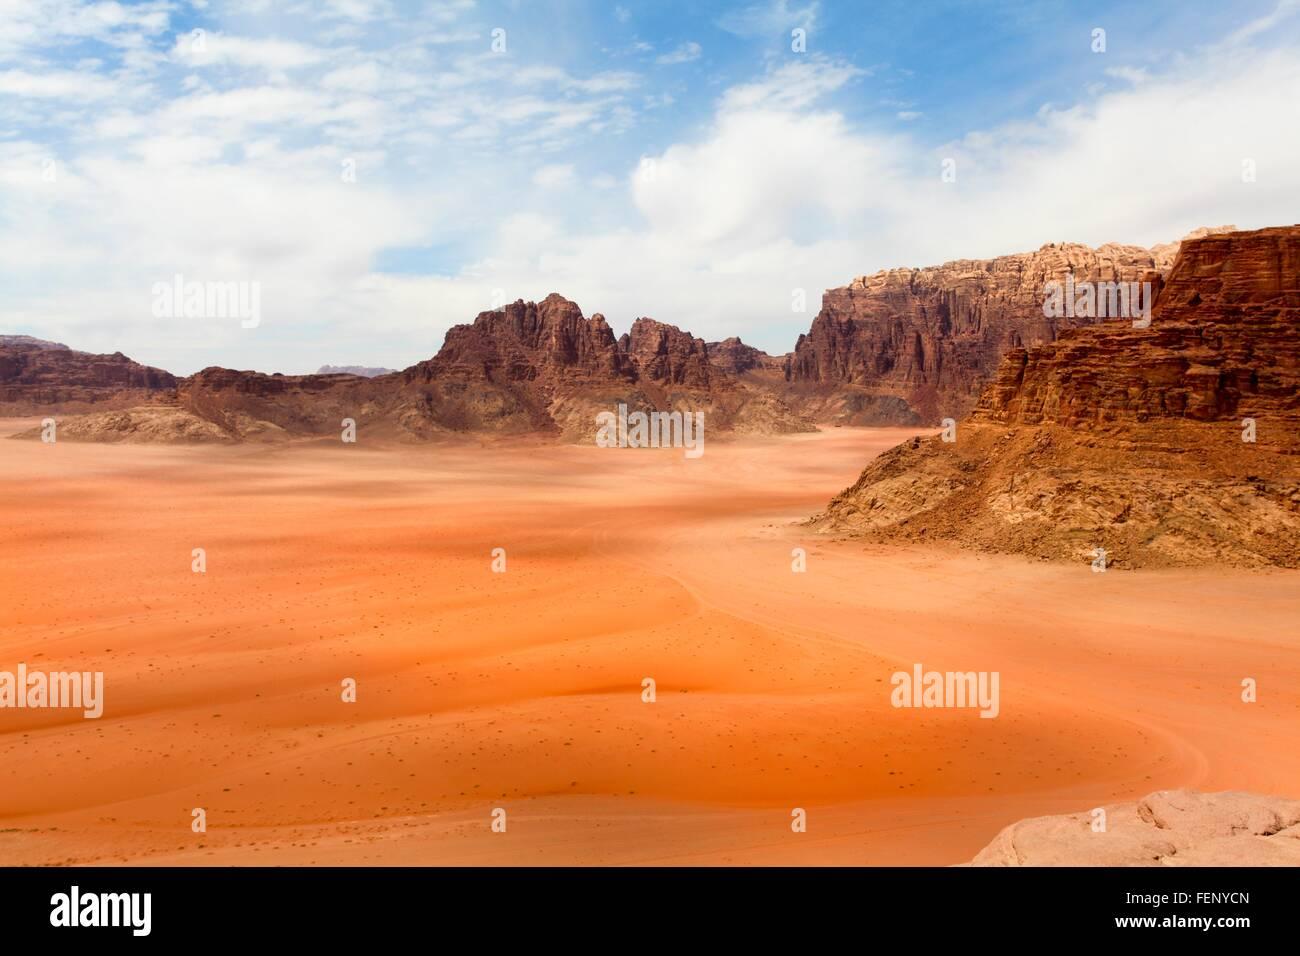 Elevated view of dessert and mountain range, Wadi Ram, Jordan - Stock Image